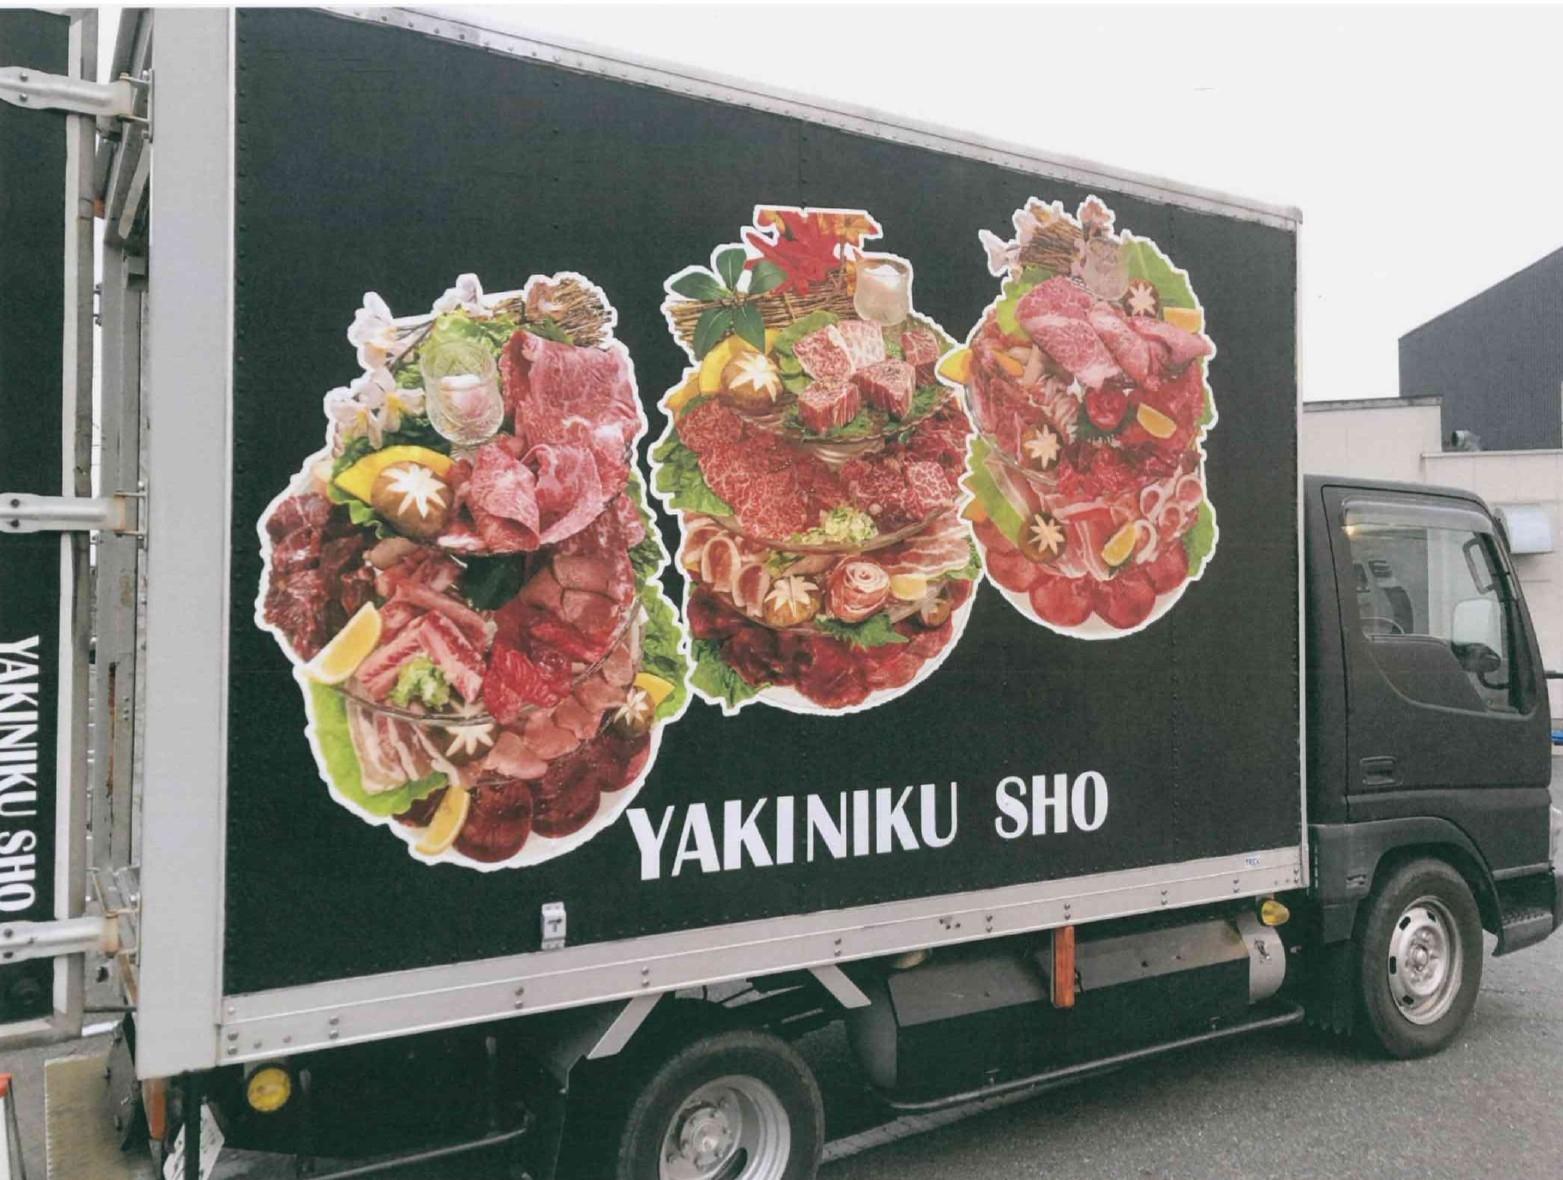 SHOのキッチンカー,愛知,大府,キッチンカー,移動販売車,フードトラック,イベント,出店,手配,ランチ,焼肉,牛串,韓国料理